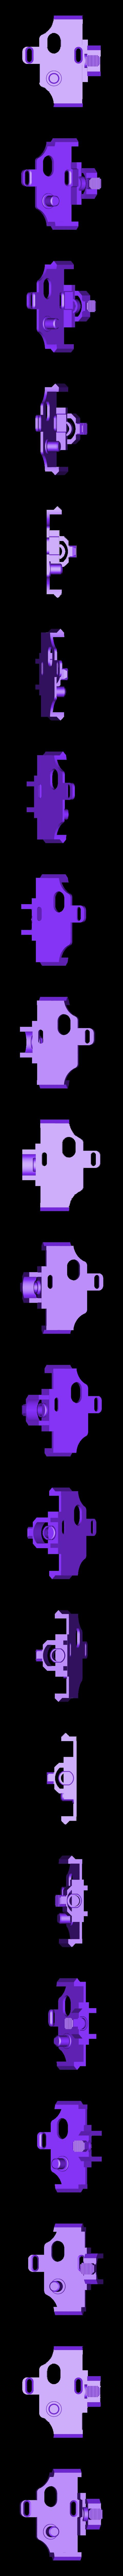 motor_support.stl Download free STL file Beltless motorized camera slider • 3D print object, Tuitxy